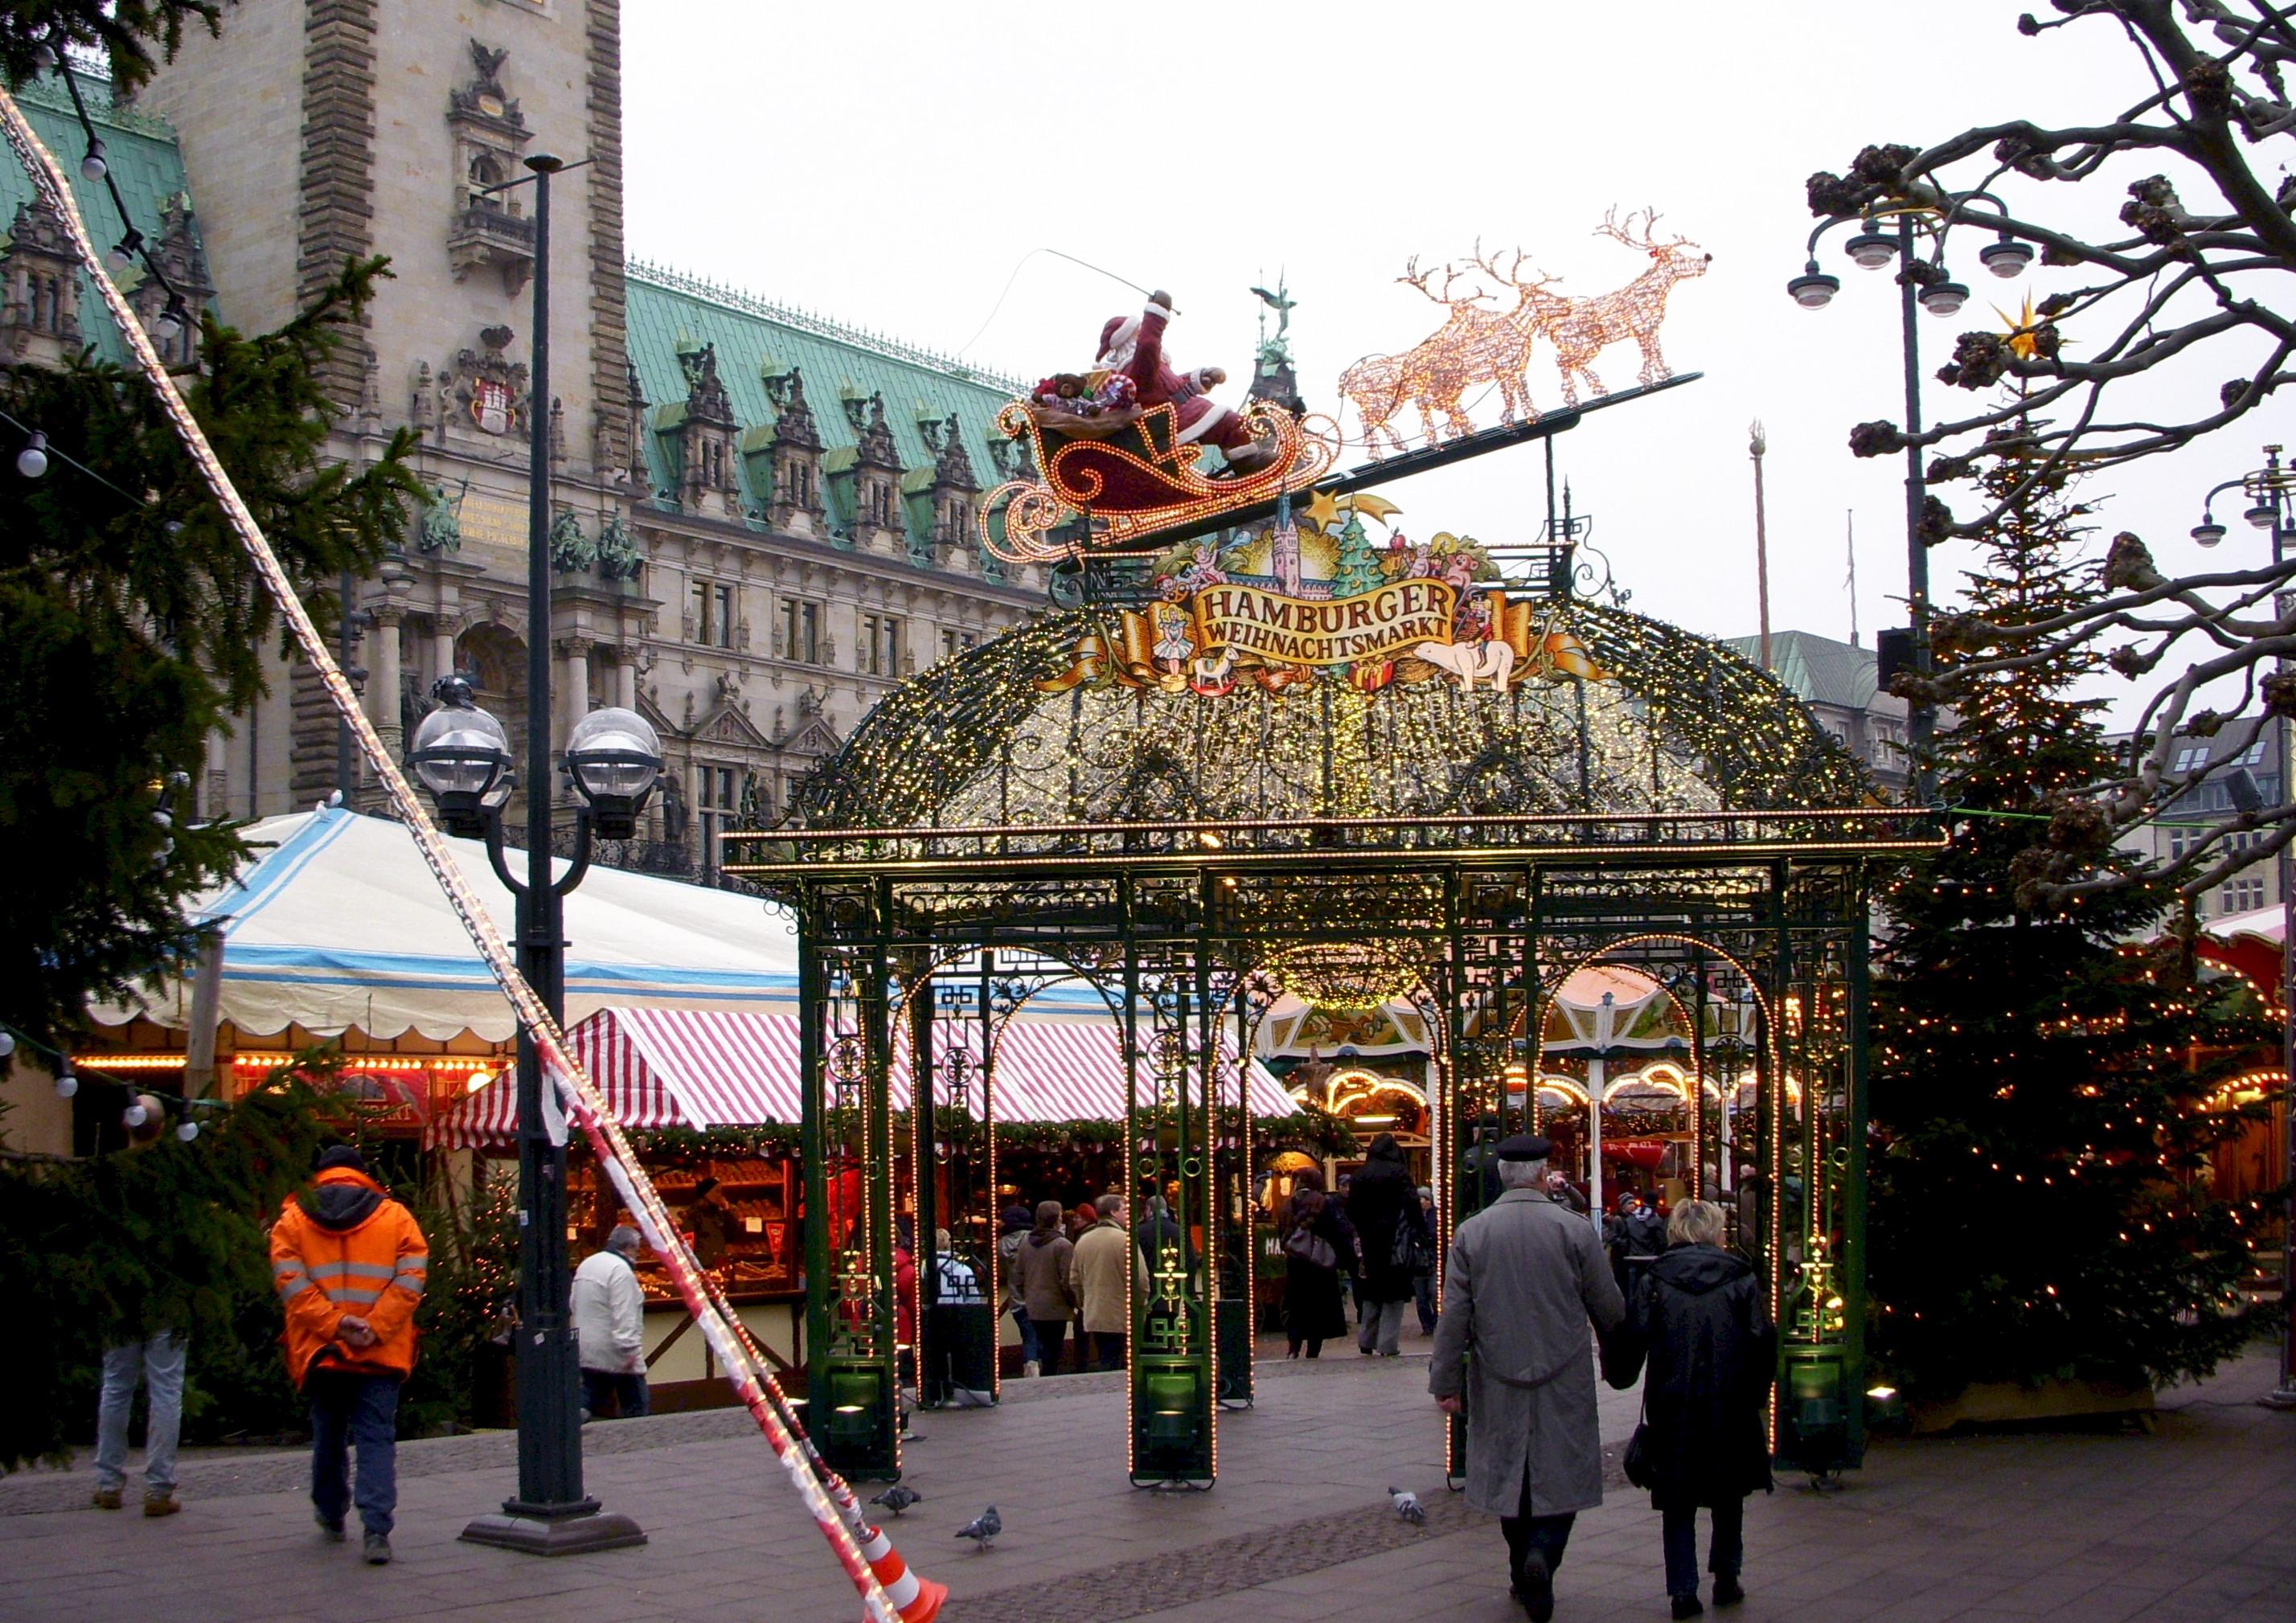 Weihnachtsmarkt I.File Weihnachtsmarkt Hamburg 2008 Jpg Wikimedia Commons